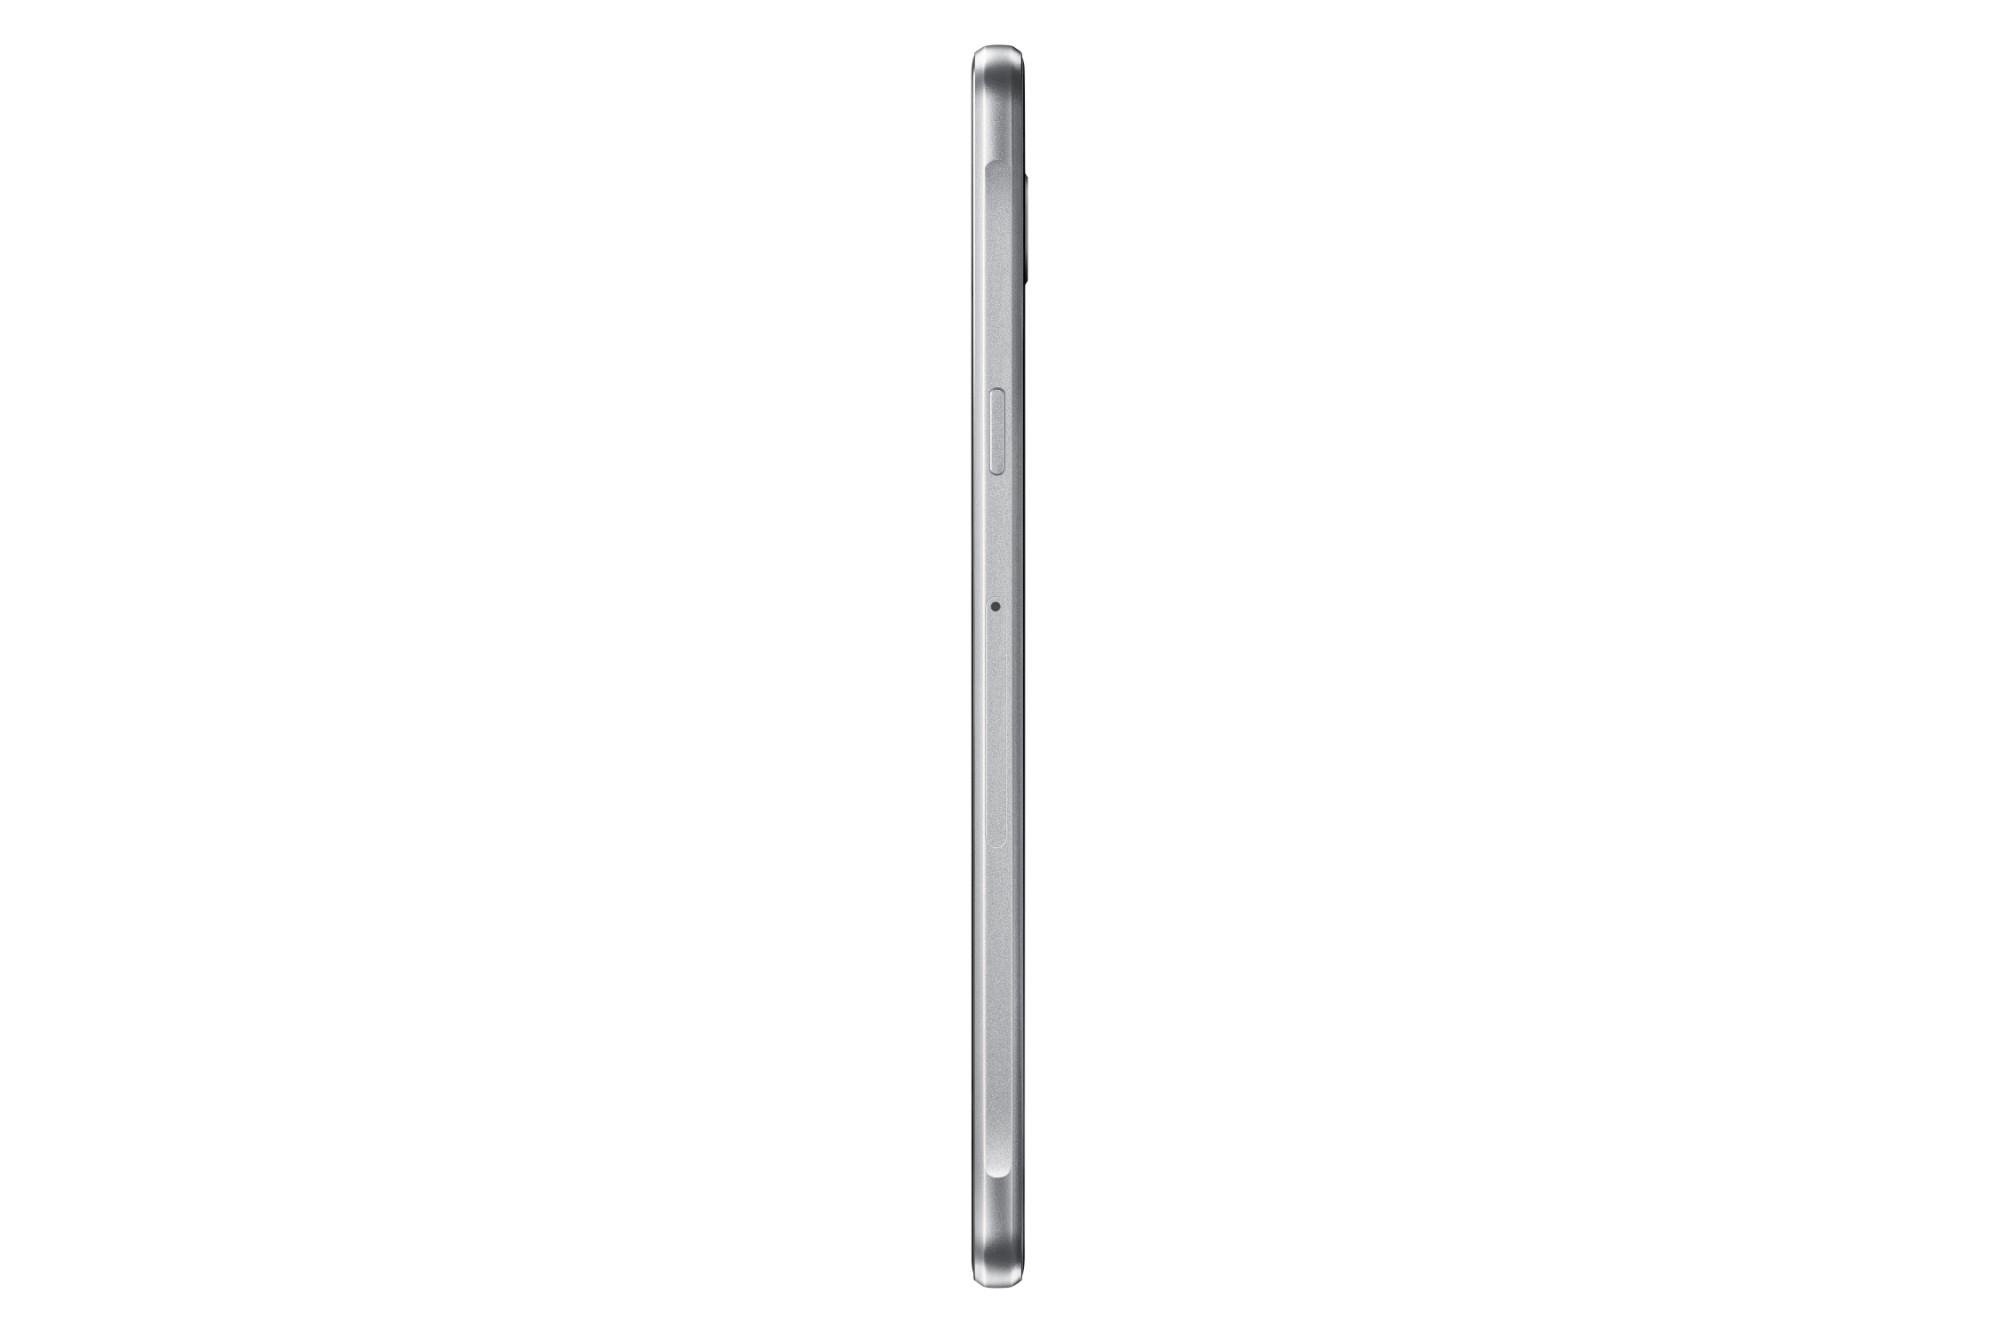 Samsung Galaxy A5 2016 Sm A510f 52 Single Sim 4g 2gb 16gb New Ram 2 Memori 2900mah Black Digital Outlet